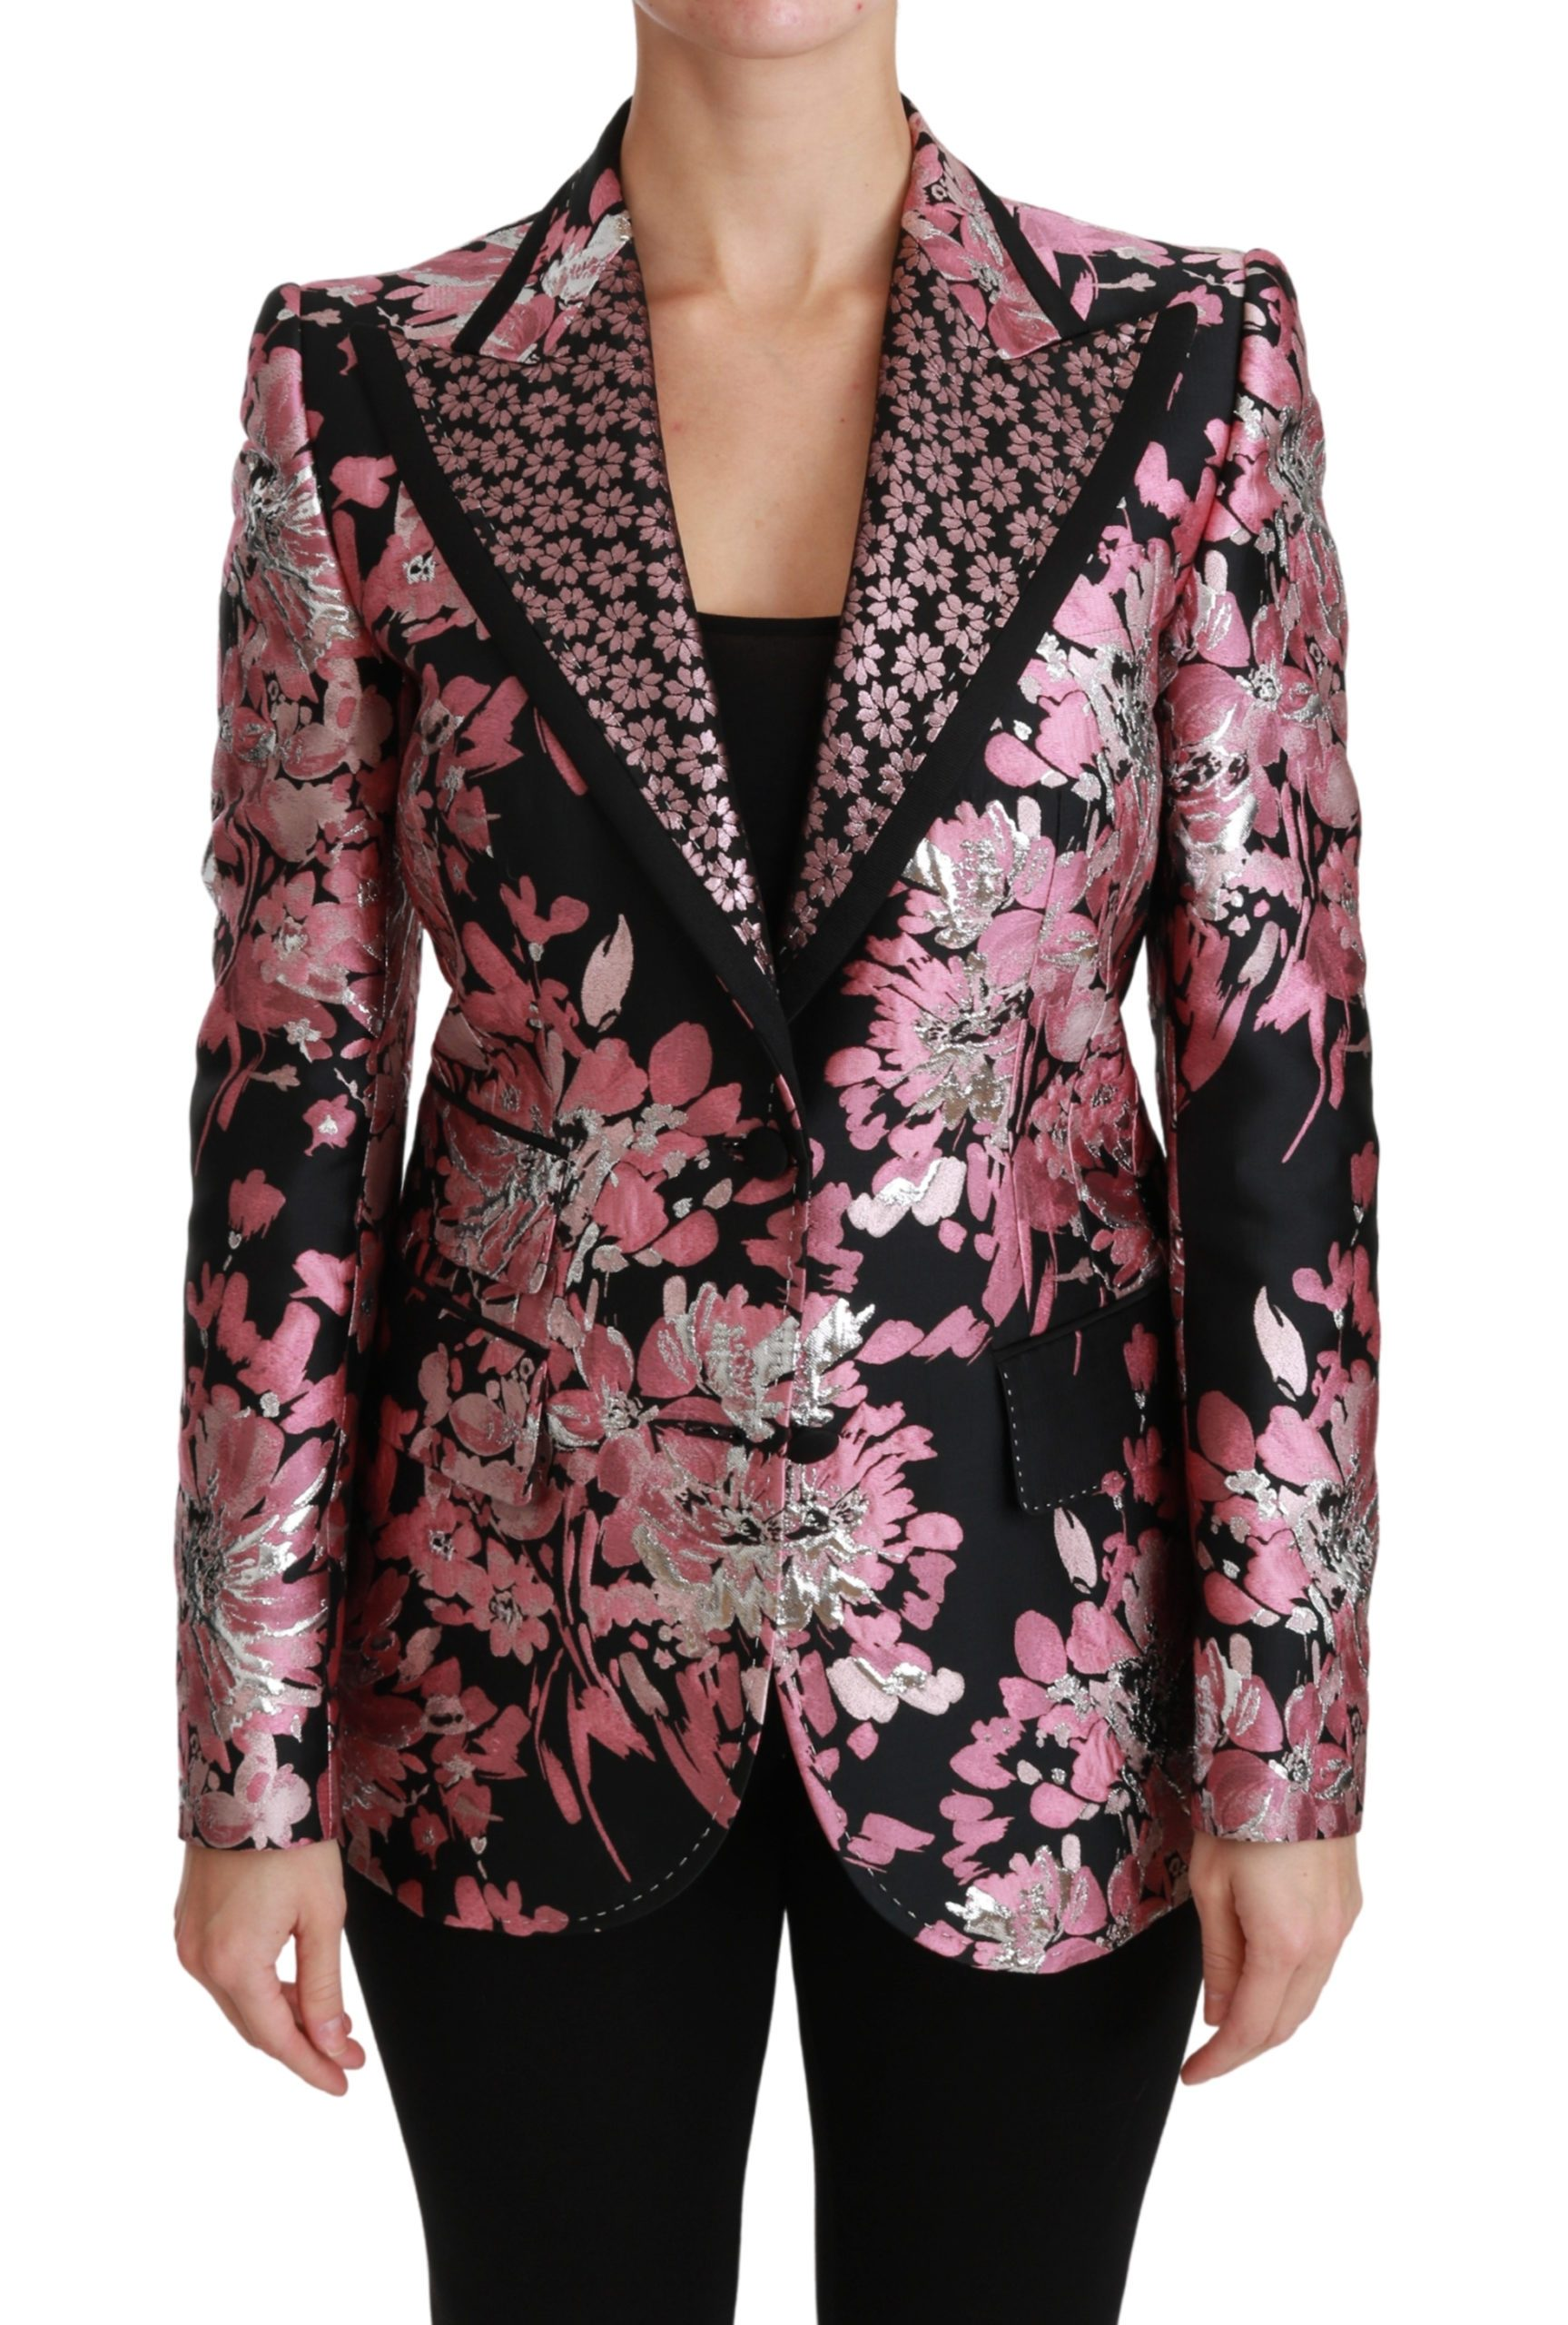 Dolce & Gabbana Women's Pink Jacquard Slim Fit Blazer Black JKT2566 - IT42 M